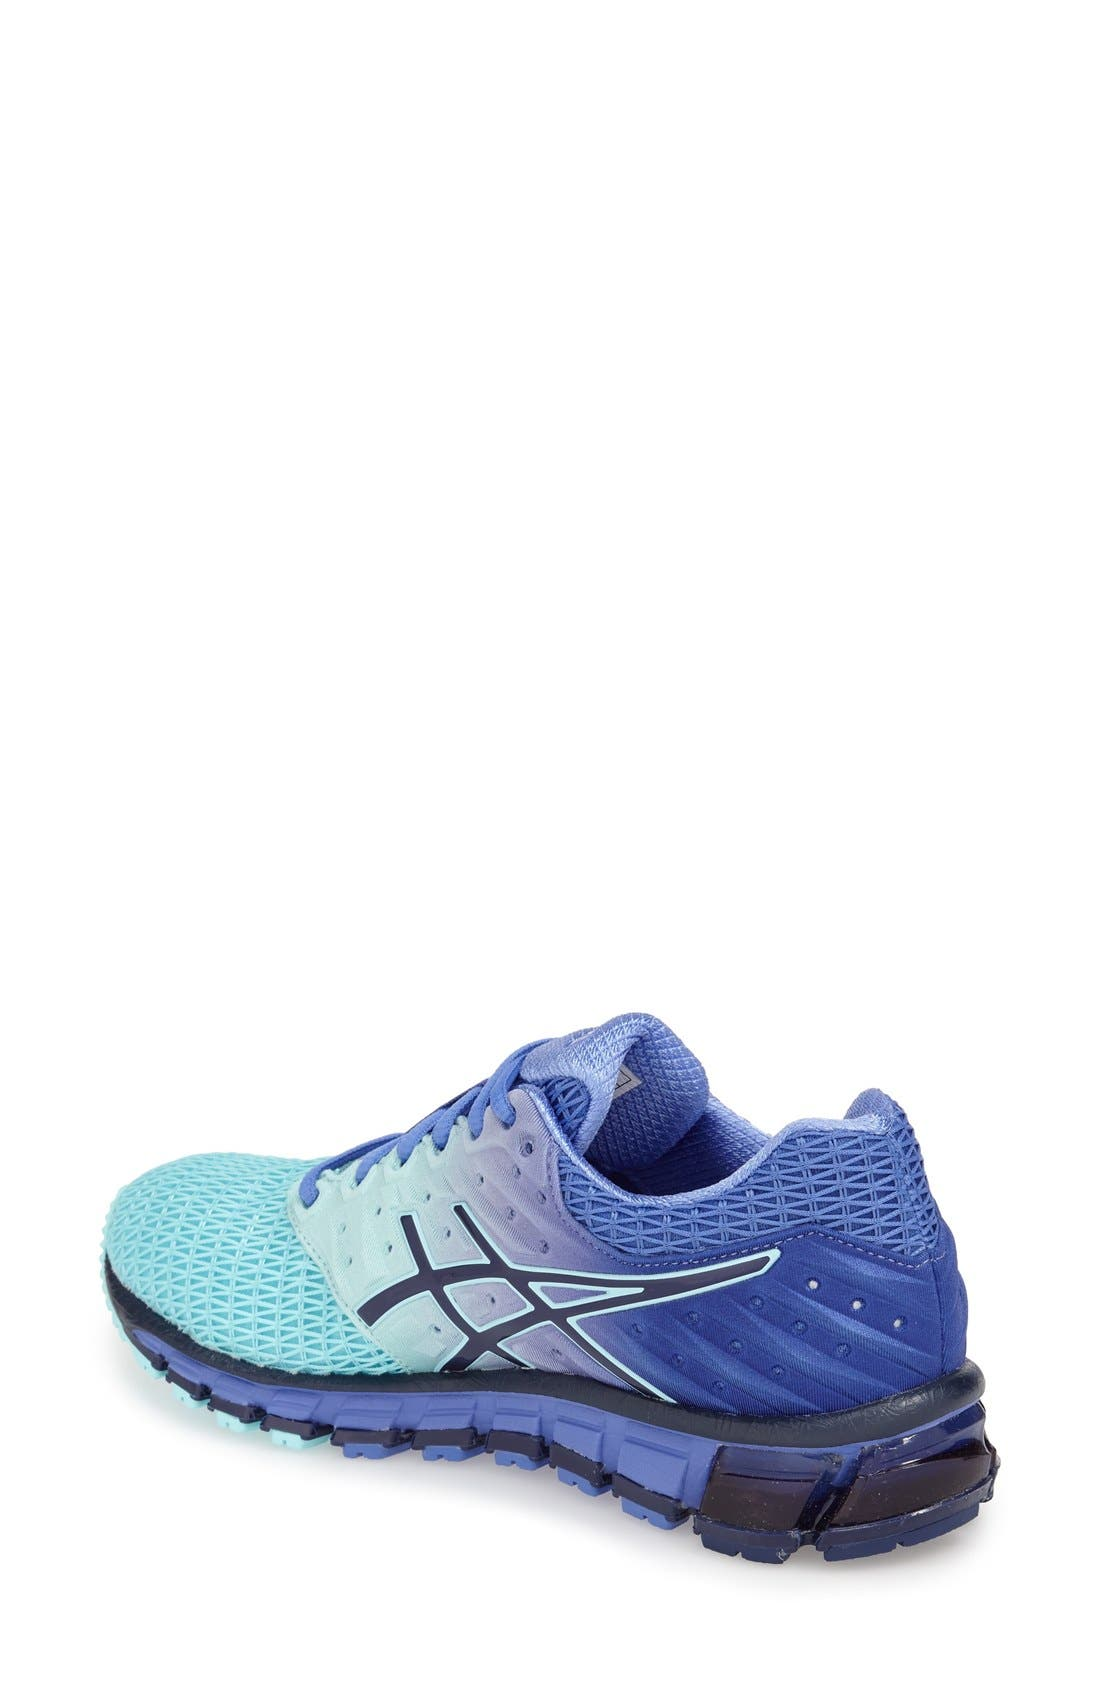 'GEL-Quantum 180 2' Running Shoe,                             Alternate thumbnail 13, color,